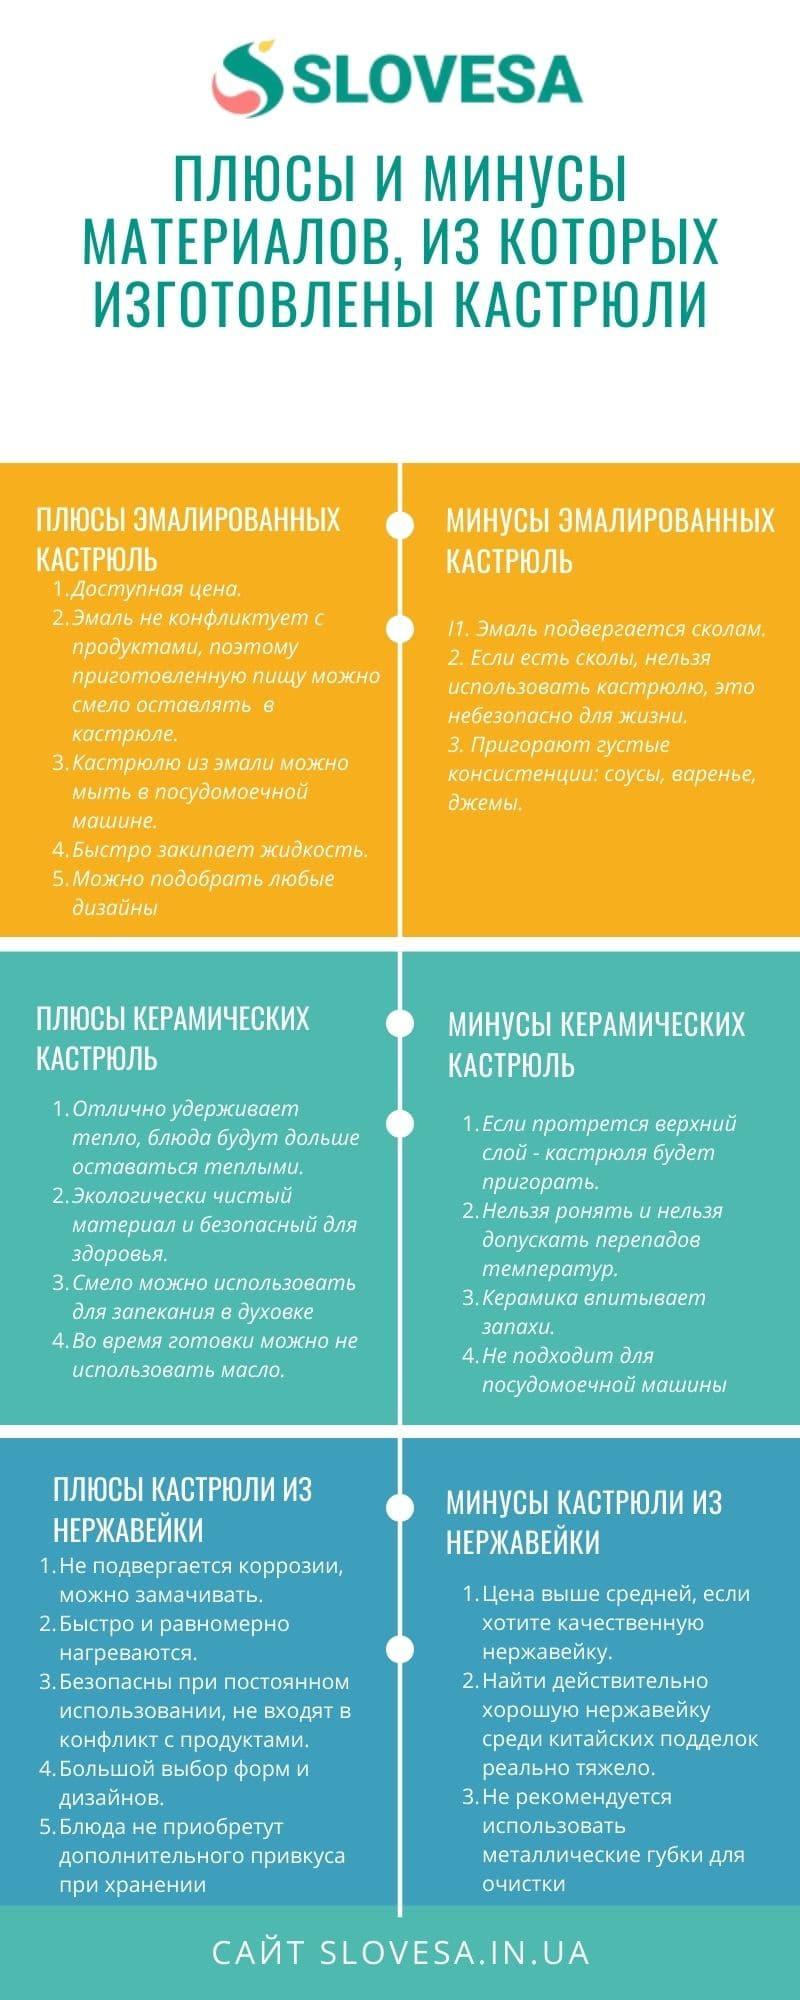 Инфографика: типы кастрюль - плюсы и минусы